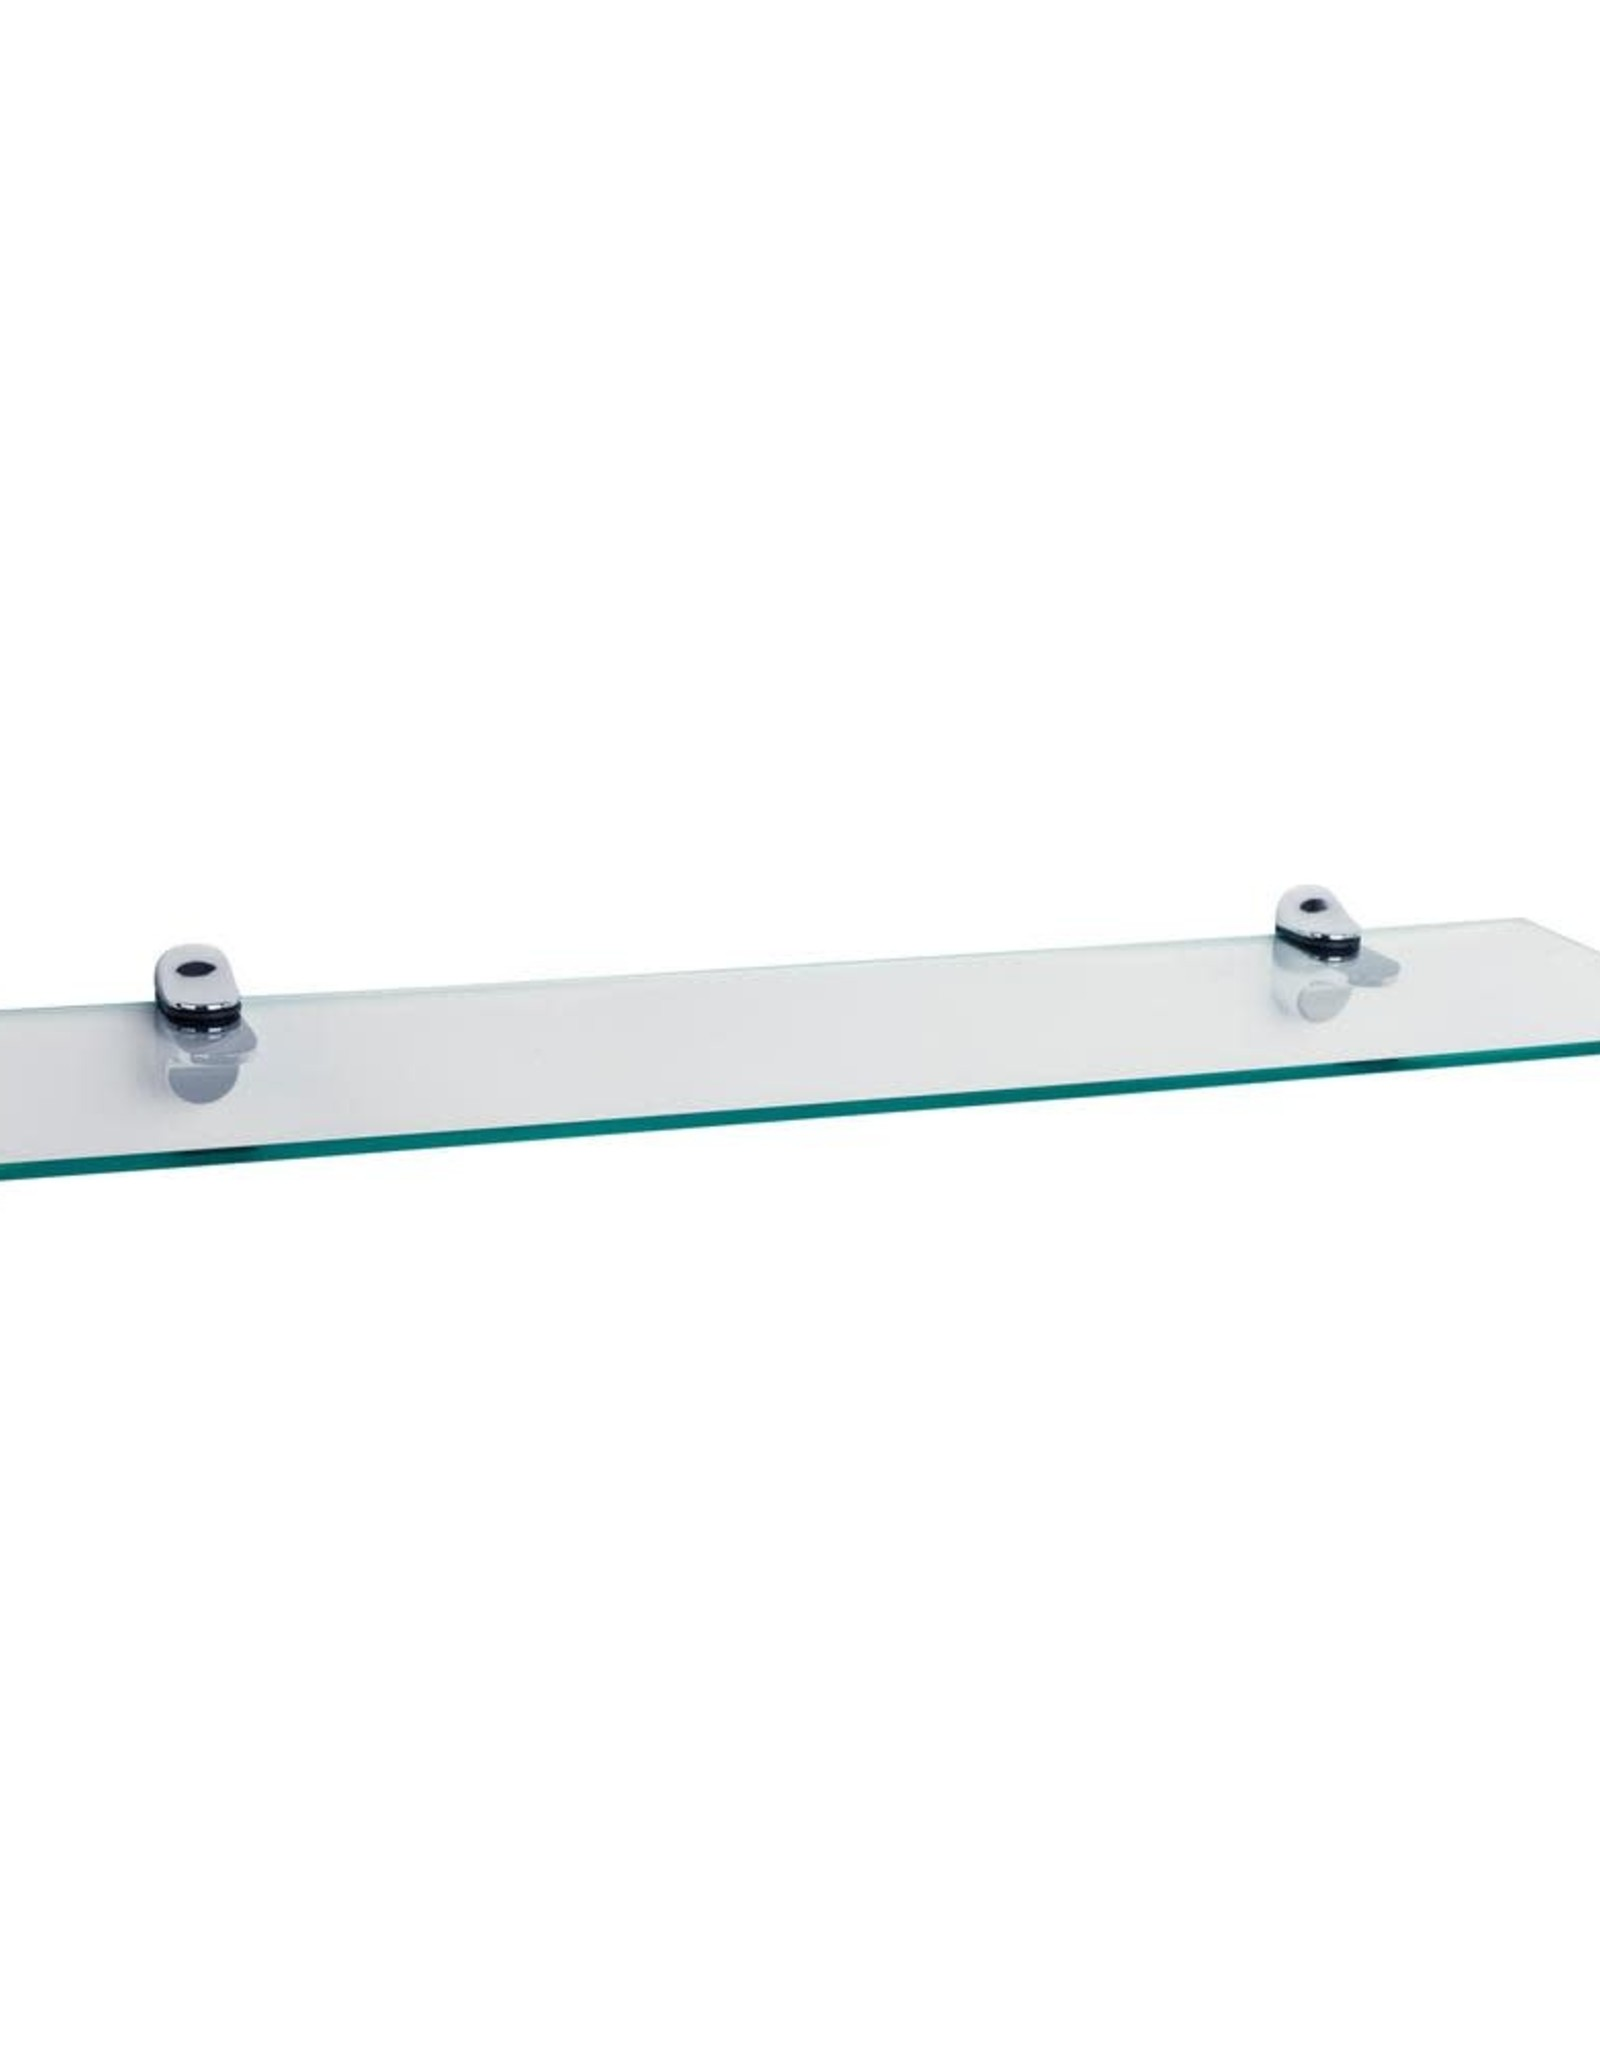 DANYA B Pristine 24 in. W x 6 in. D Clear Glass Floating Shelf with Chrome Brackets